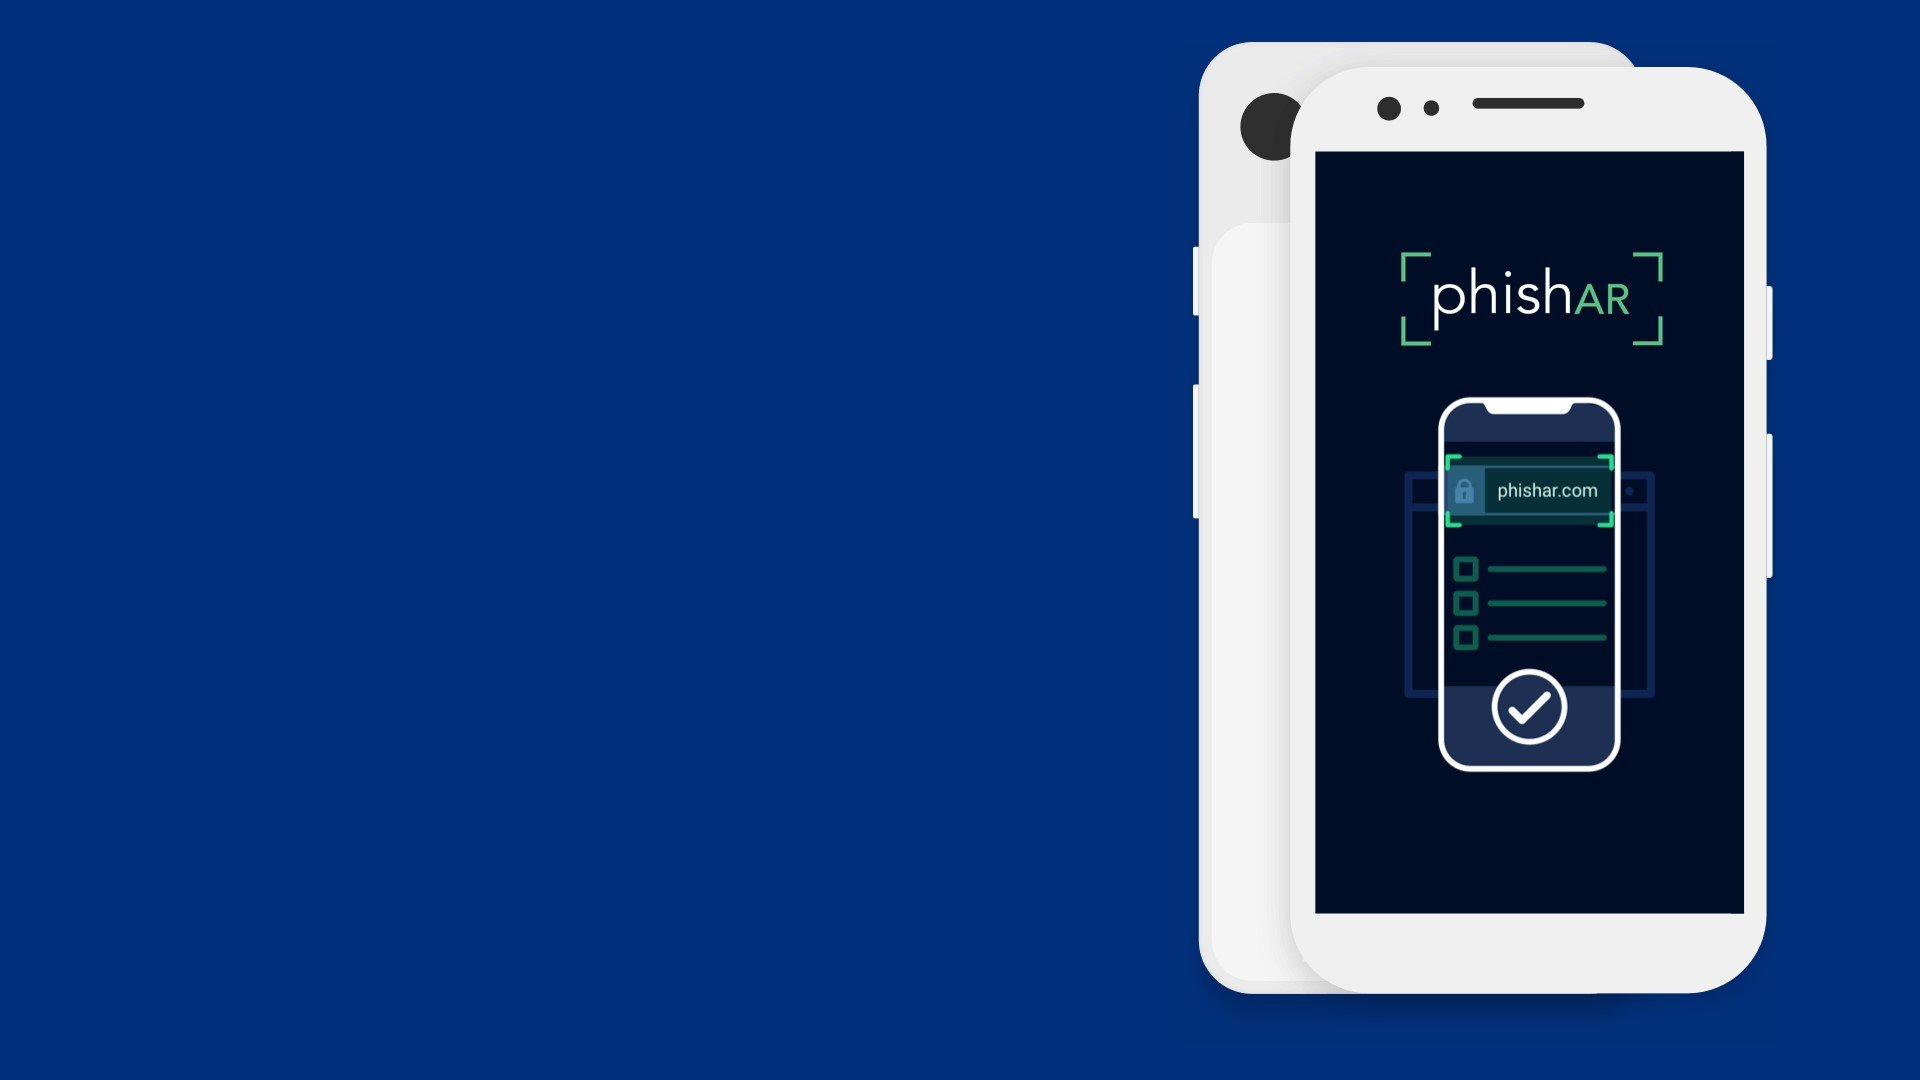 Oxford University creates its 200th spinout company PhishAR